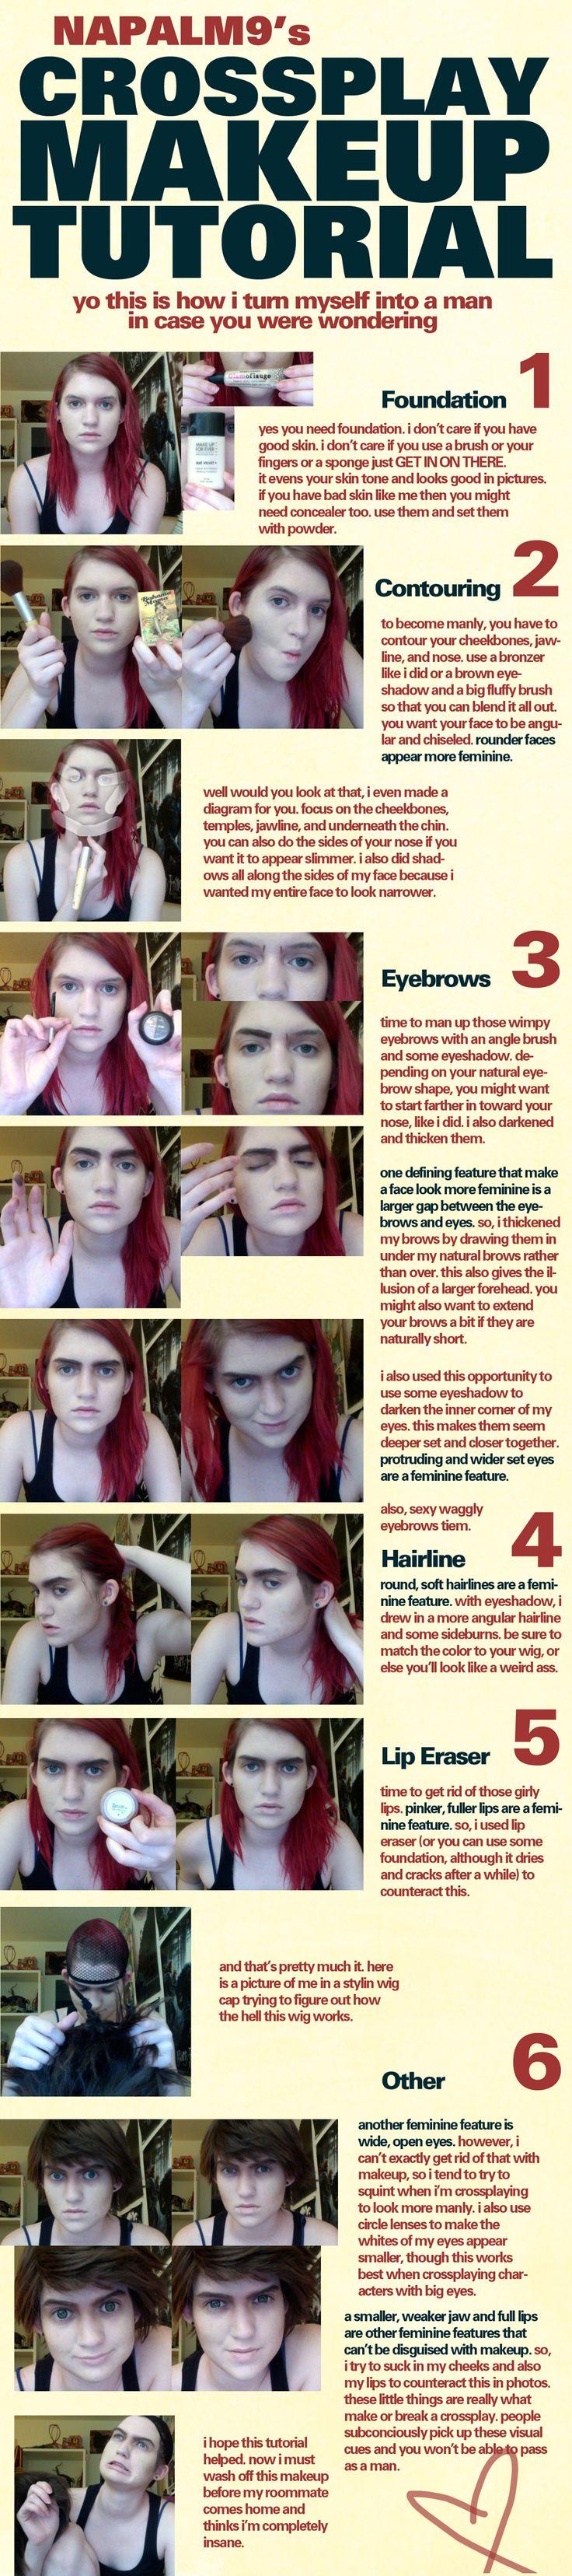 ftm crossplay makeup/tips